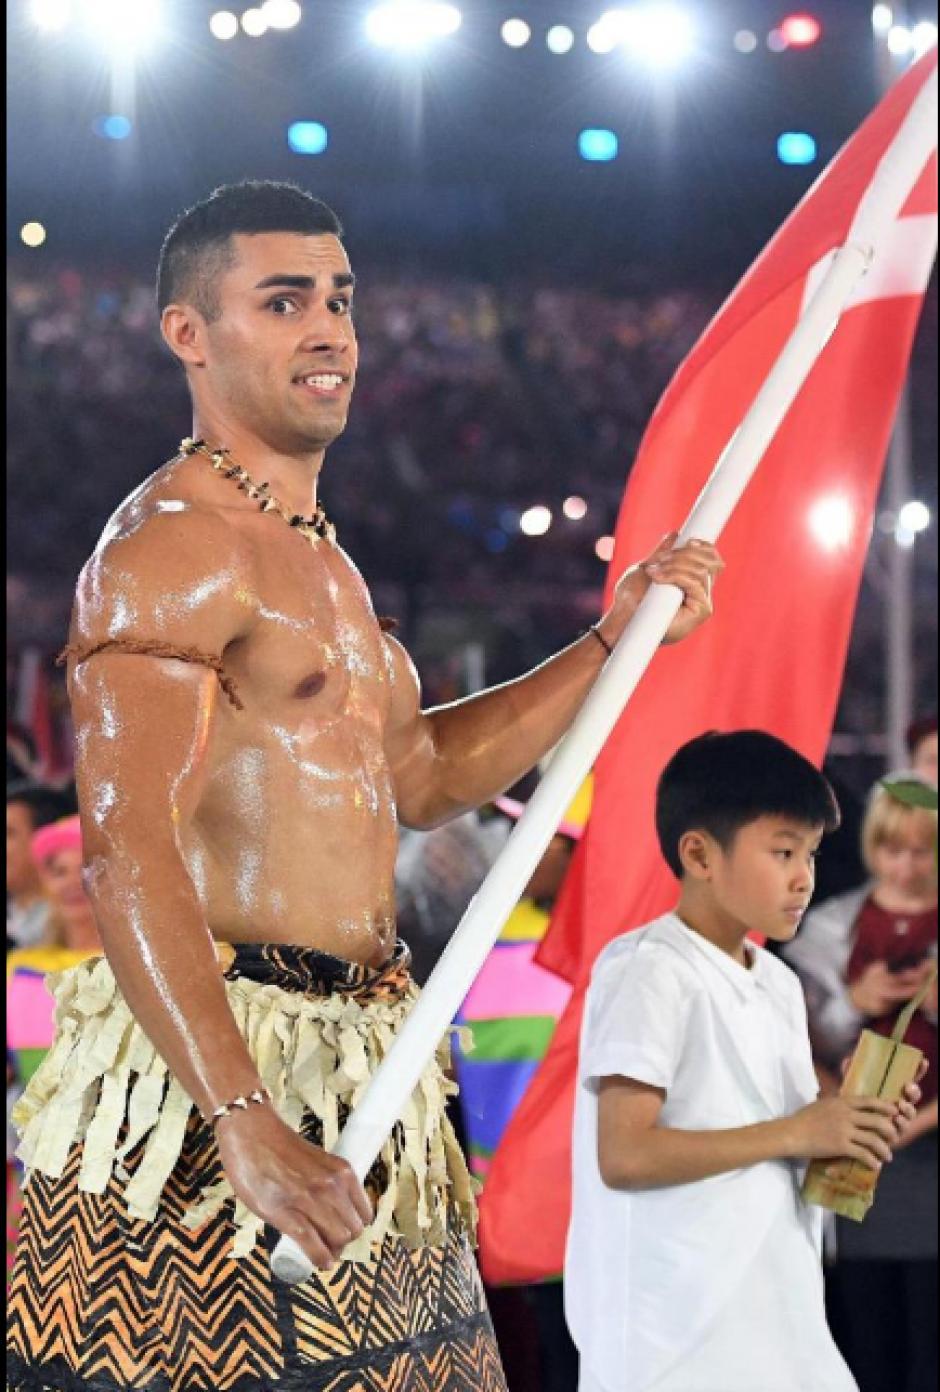 Tonga, su país de origen, se compone de 169 islas. (Foto: Twitter)